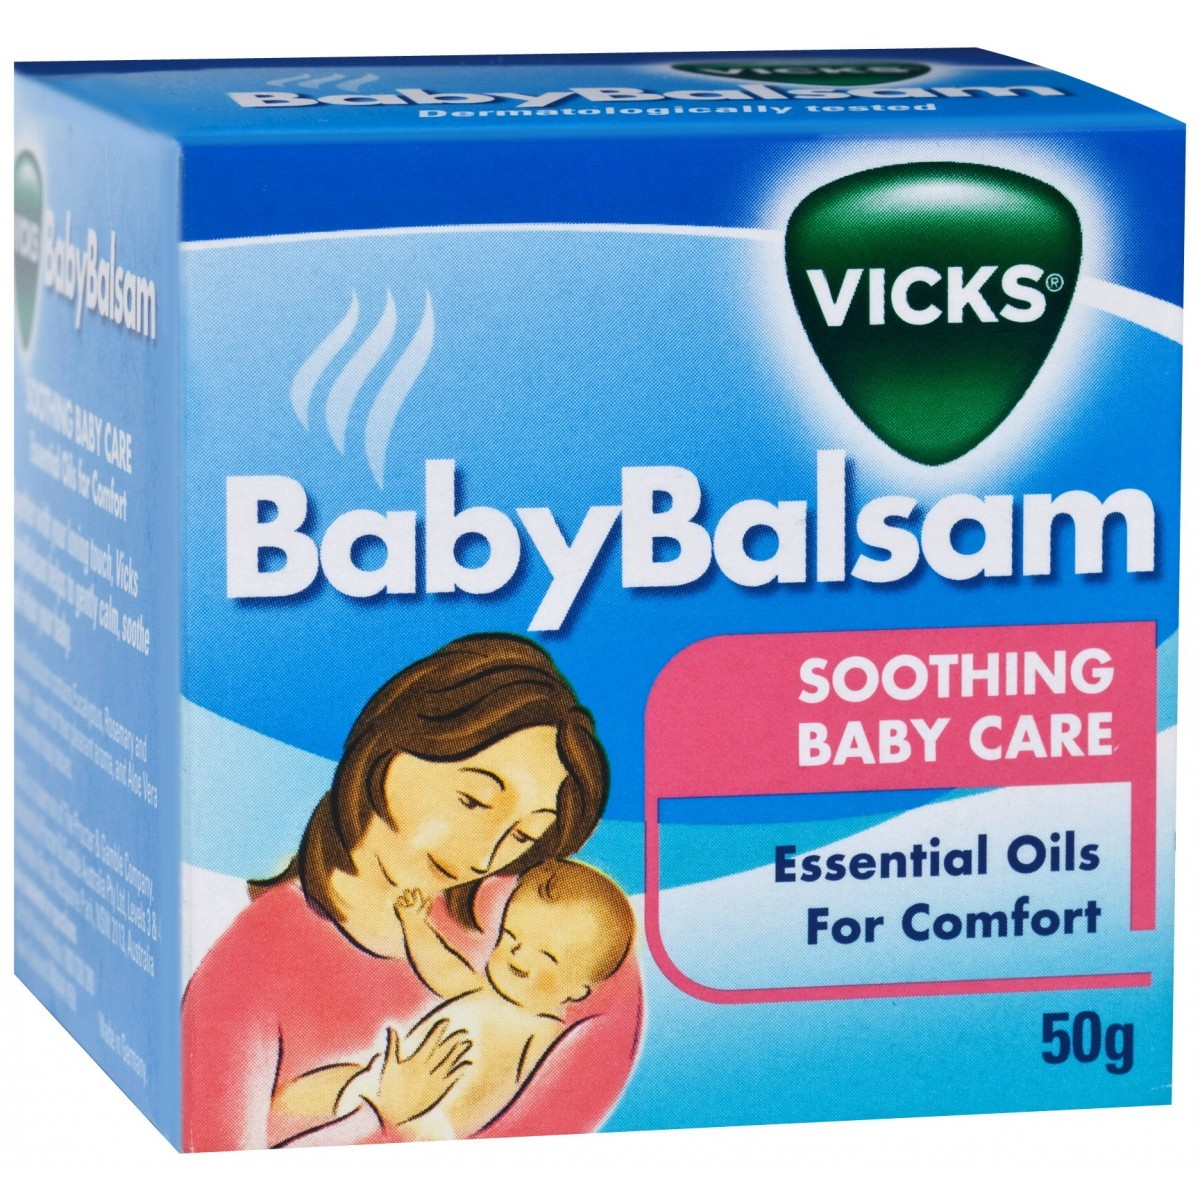 Vicks Baby Balsam (50g) image